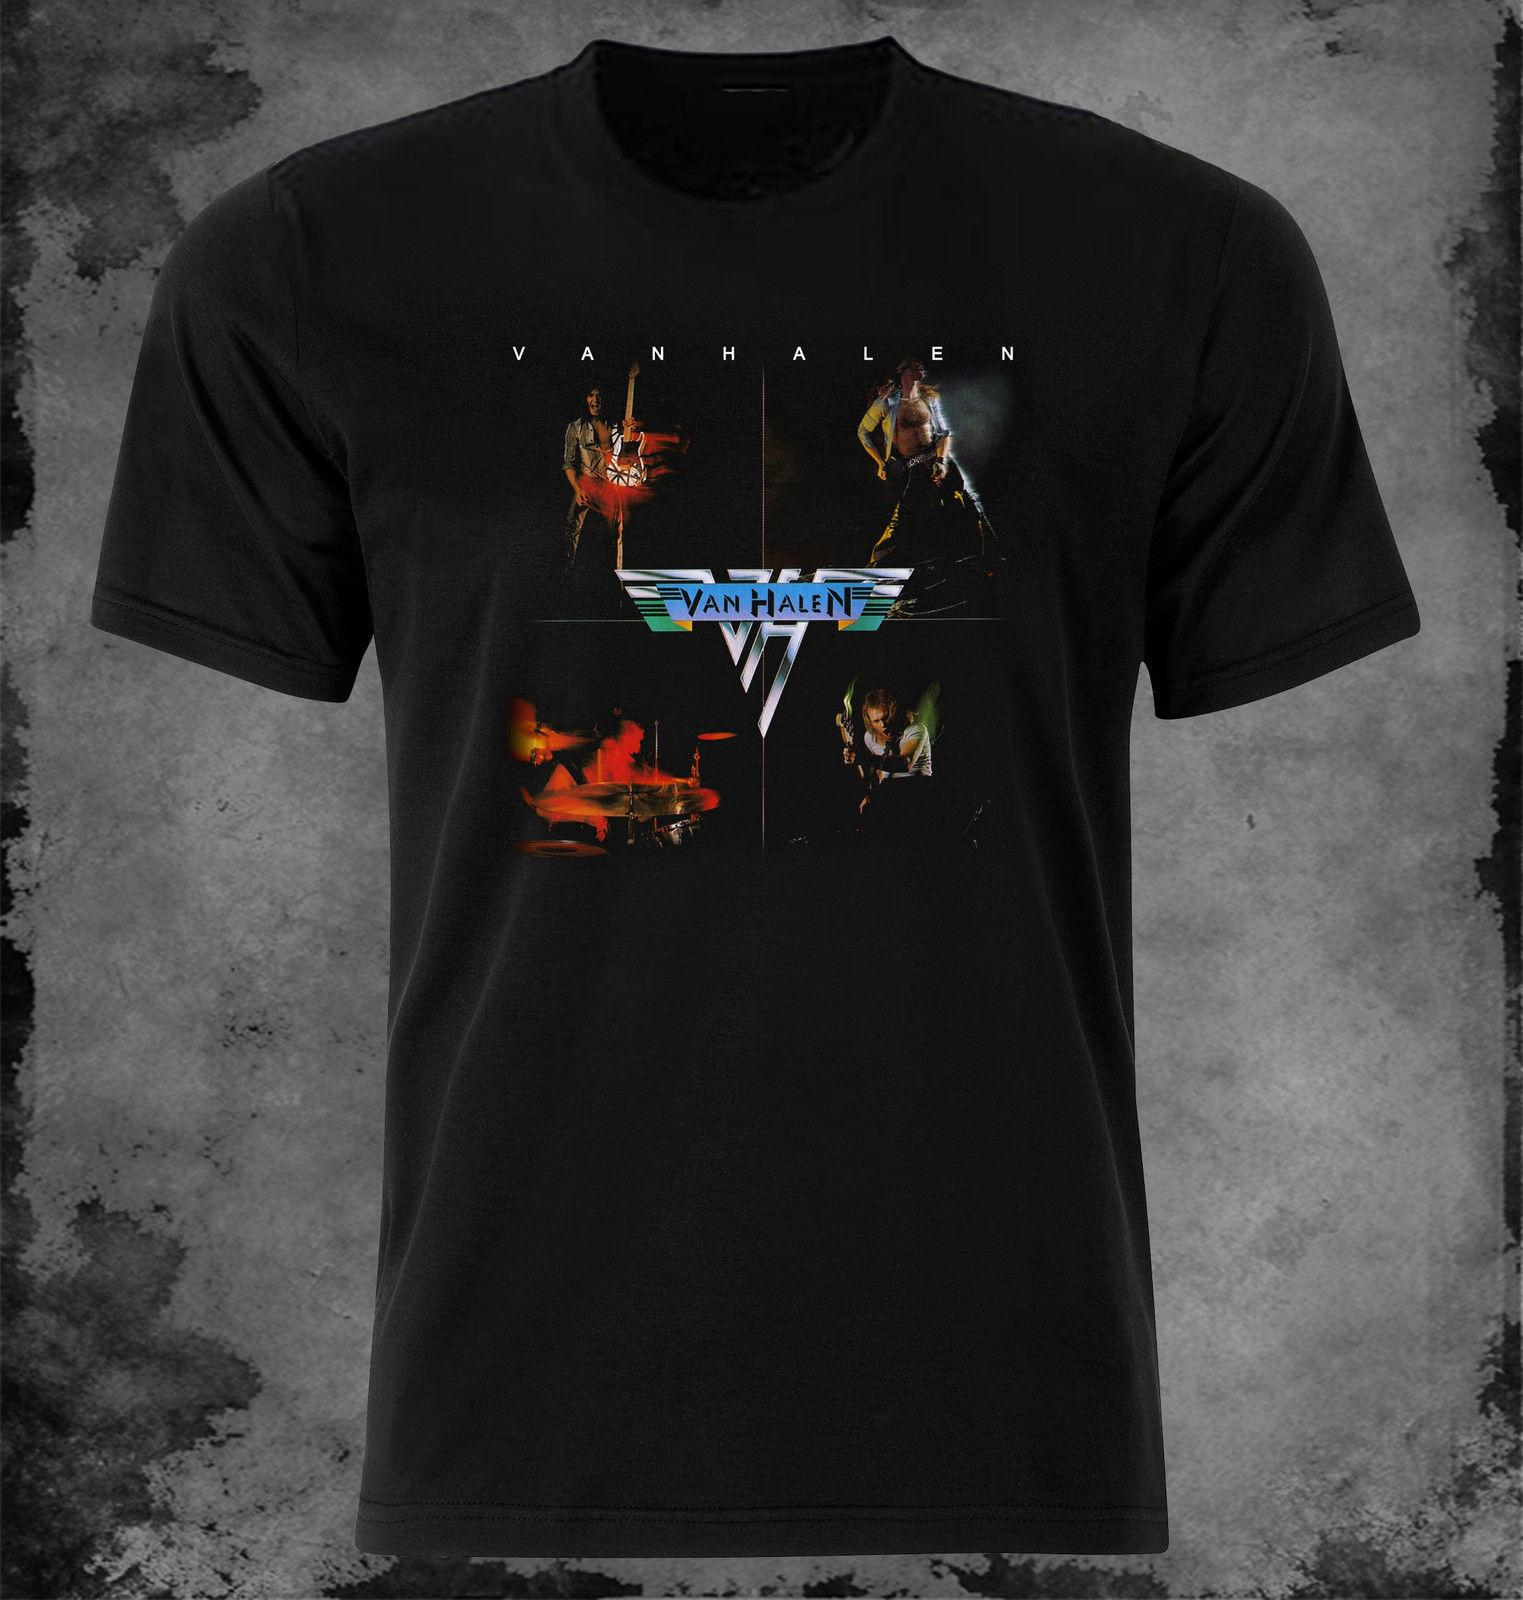 23b23532f7bd Van Halen Van Halen T Shirt XSXL First Album Buy Shirt Designs Funny Clever T  Shirts From Hiphoptshirt, $13.19  DHgate.Com